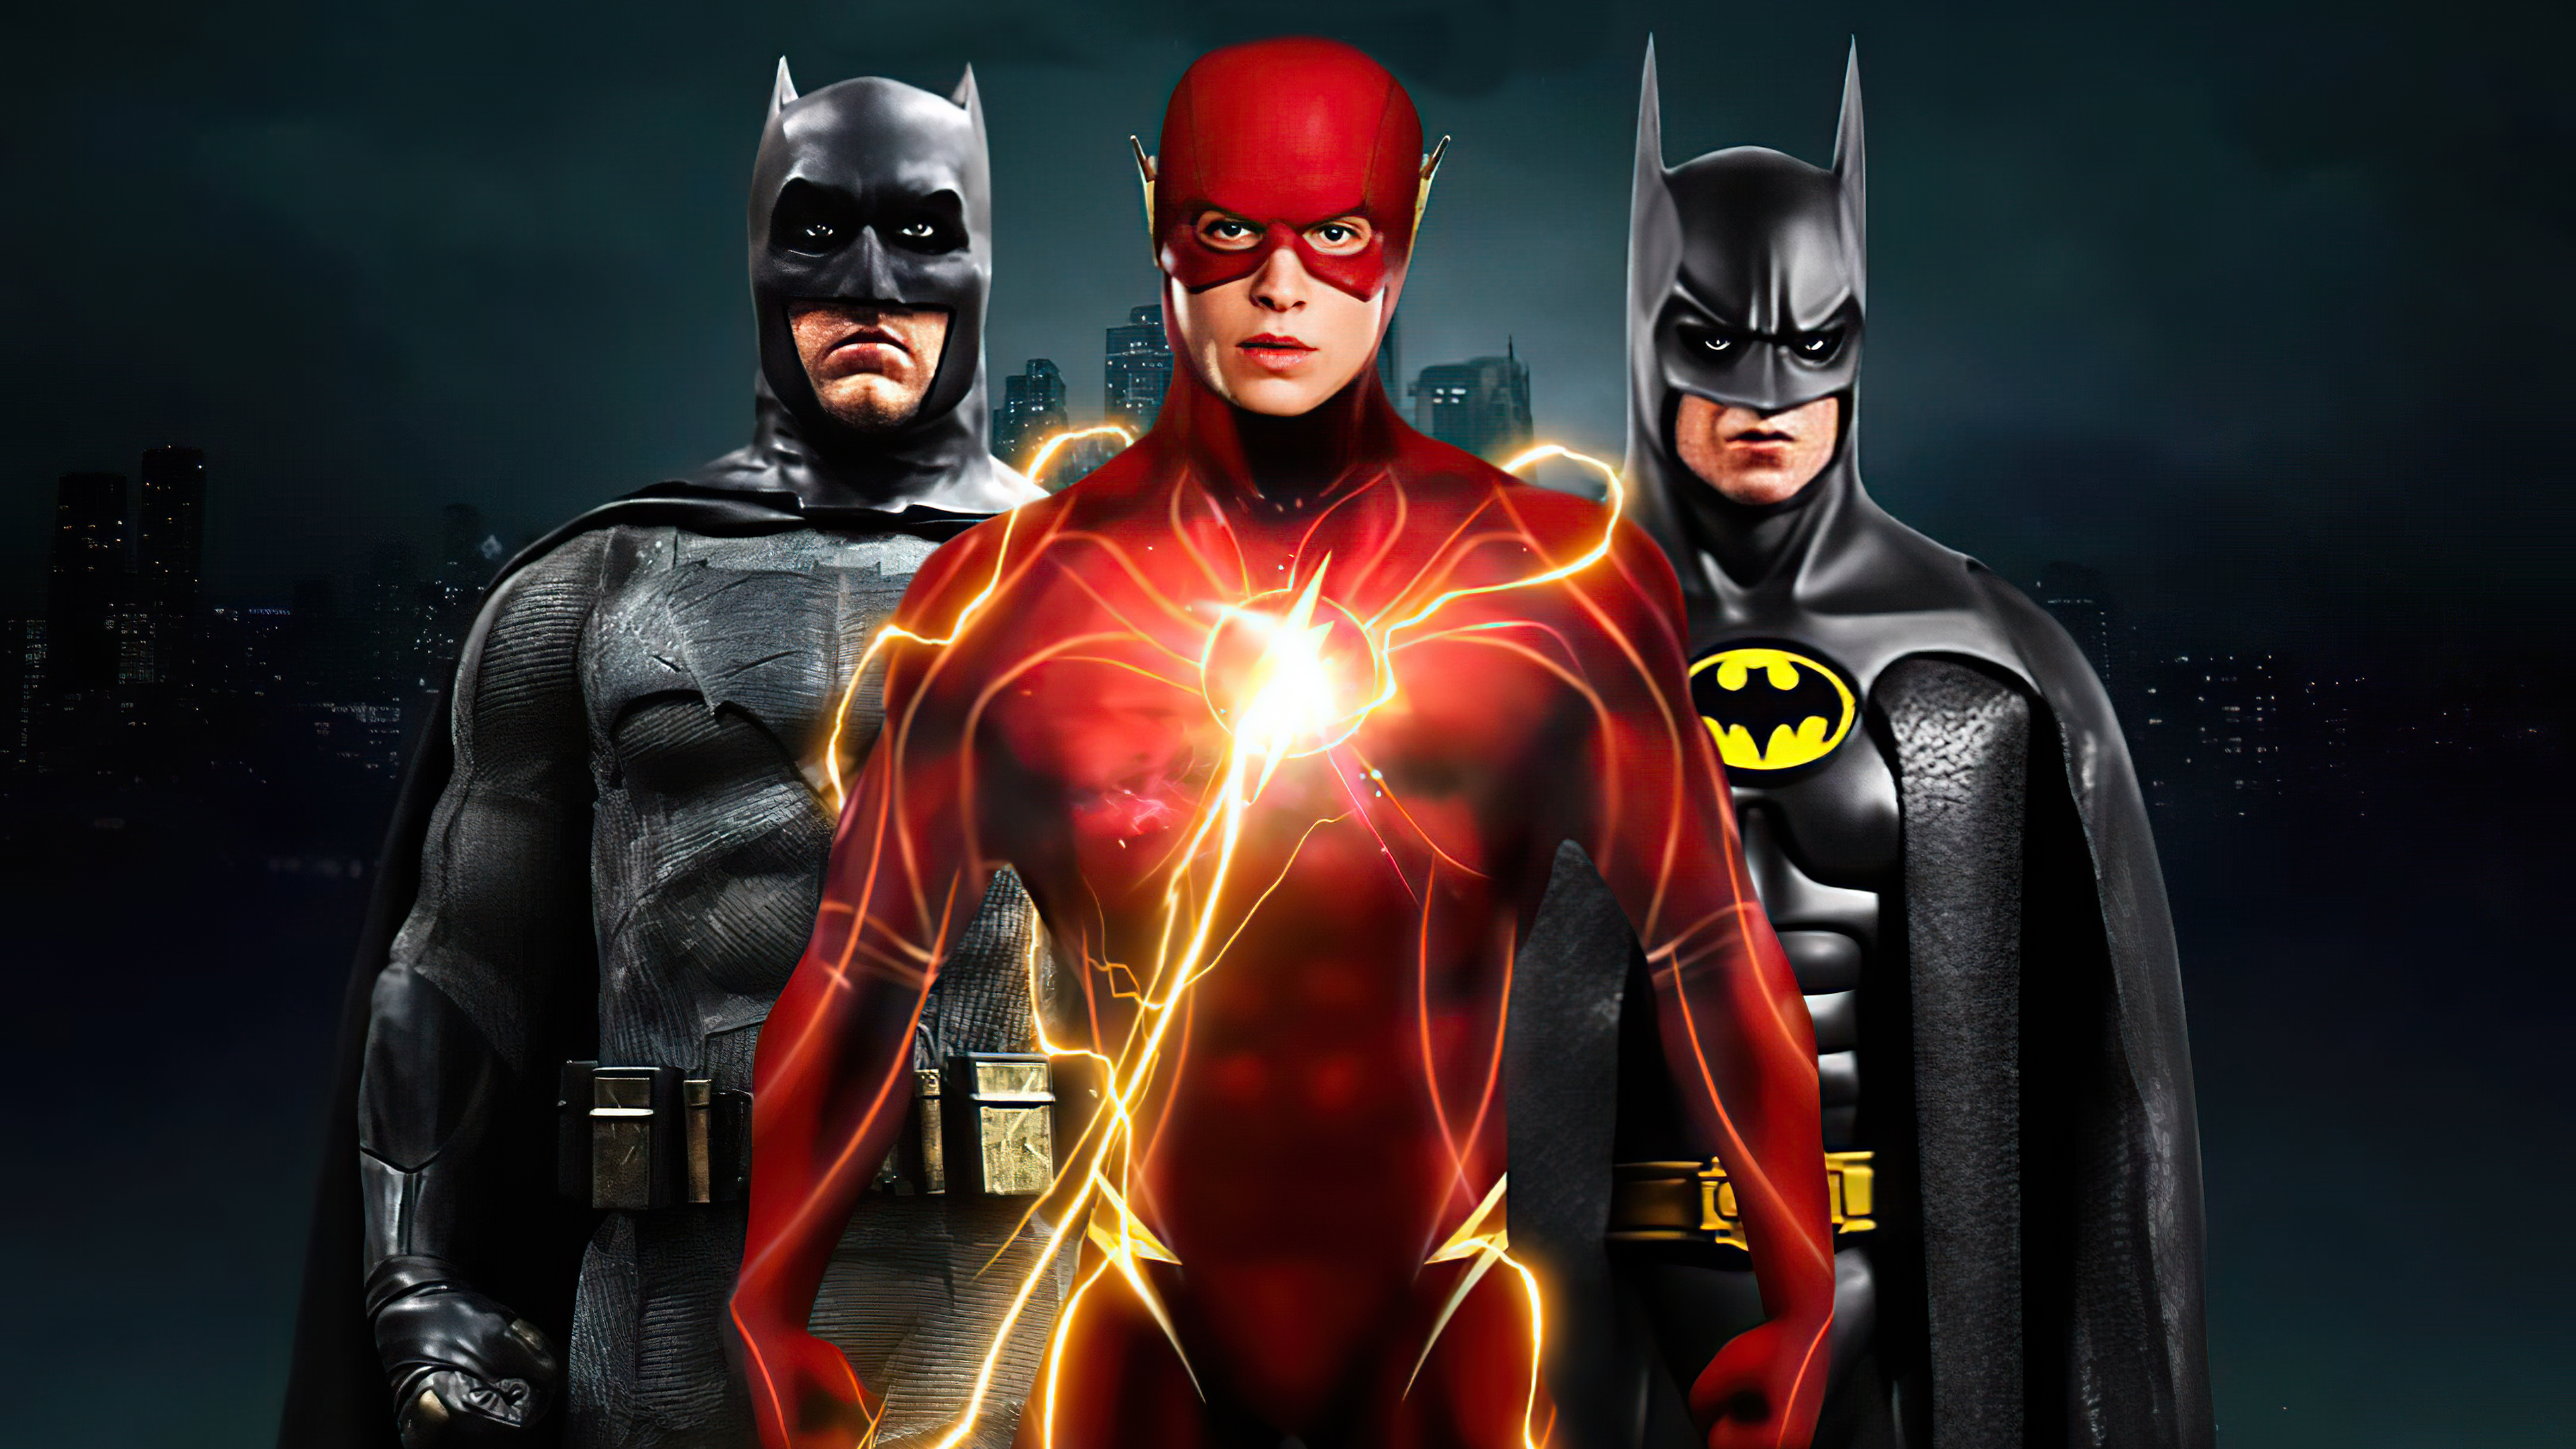 flash and two batmans 4k 1617446726 - Flash And Two Batmans 4k - Flash And Two Batmans 4k wallpapers